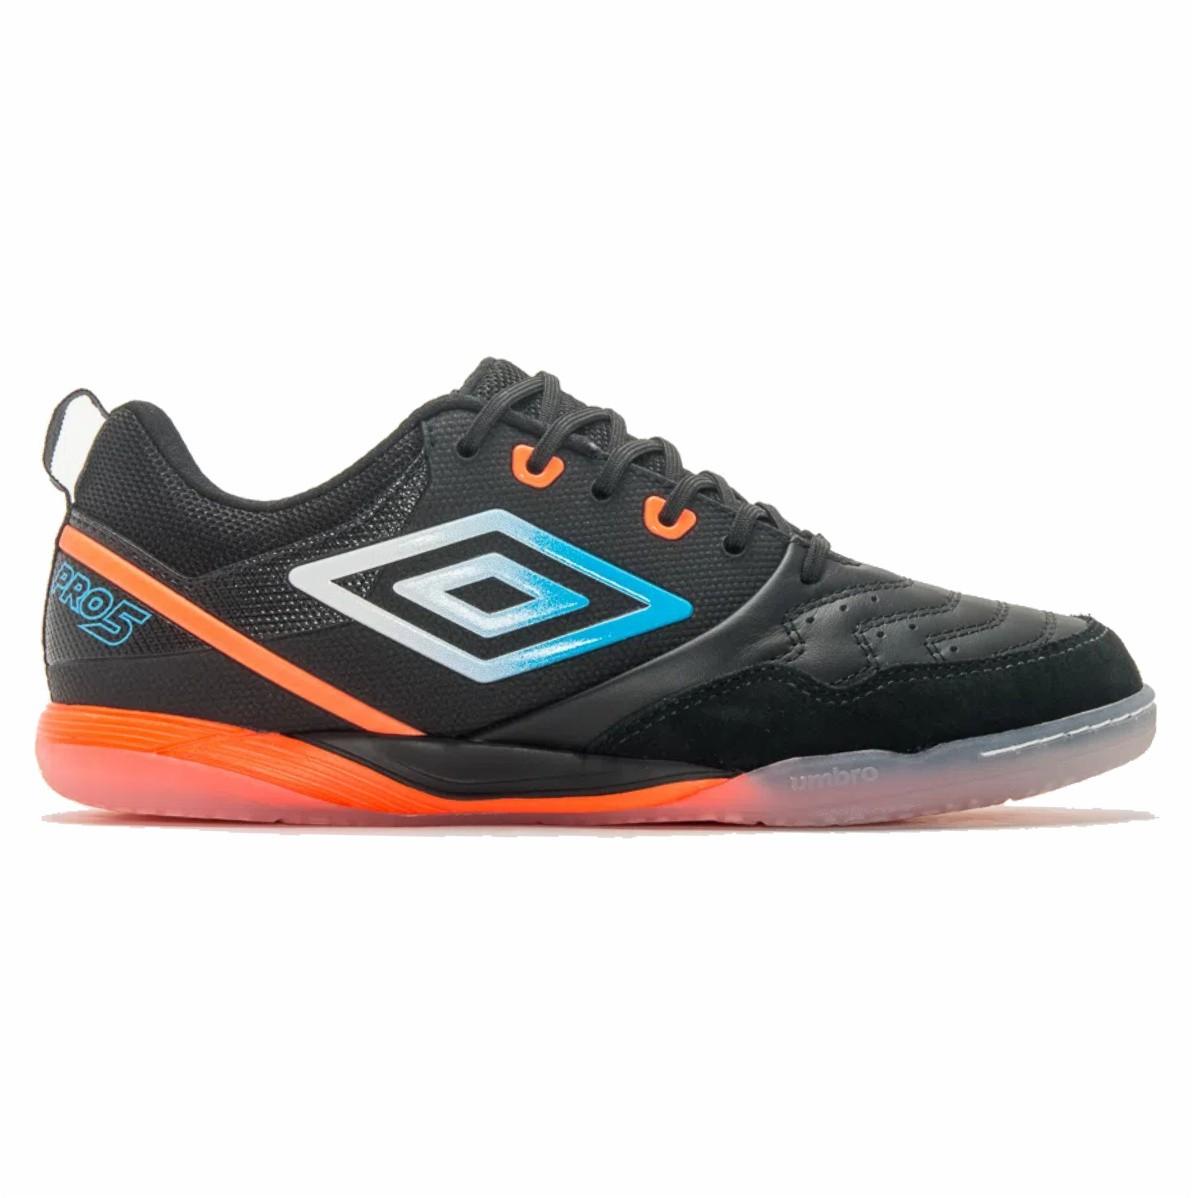 Tenis Umbro Pro 5 Chuteira Futsal Profissional